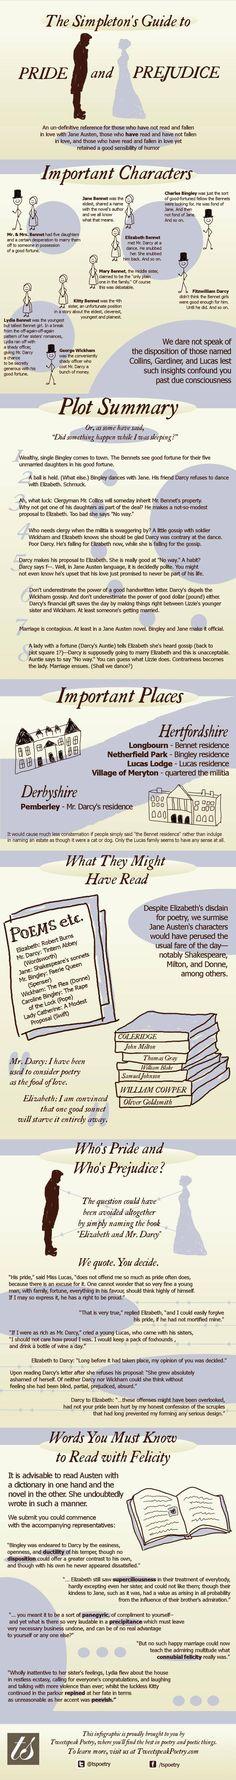 Tweet Speak Poetry created this nifty guide to Jane Austen's Pride and Prejudice!